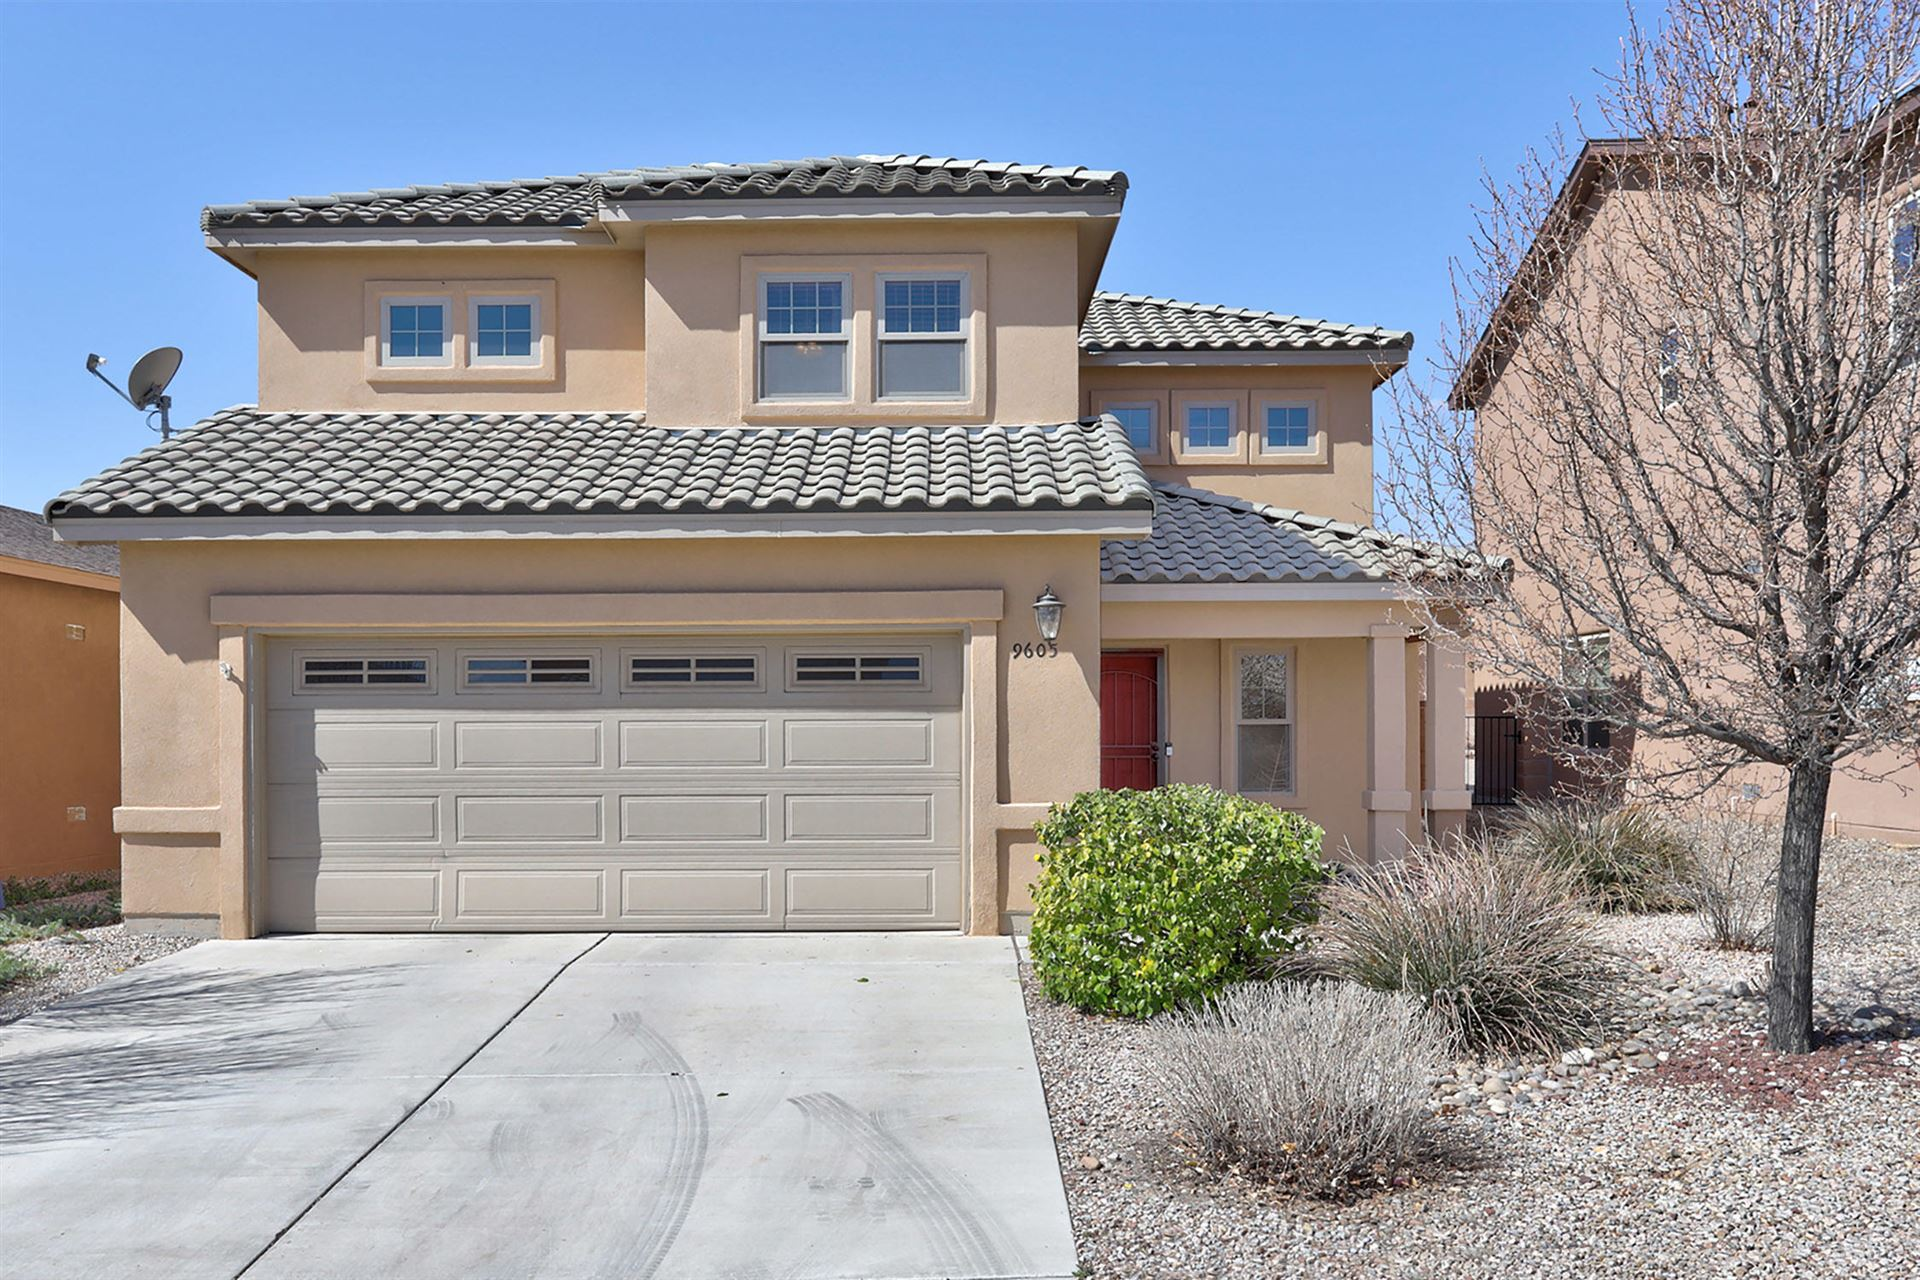 9605 Jacks Creek Road NW, Albuquerque, NM 87114 - MLS#: 987448